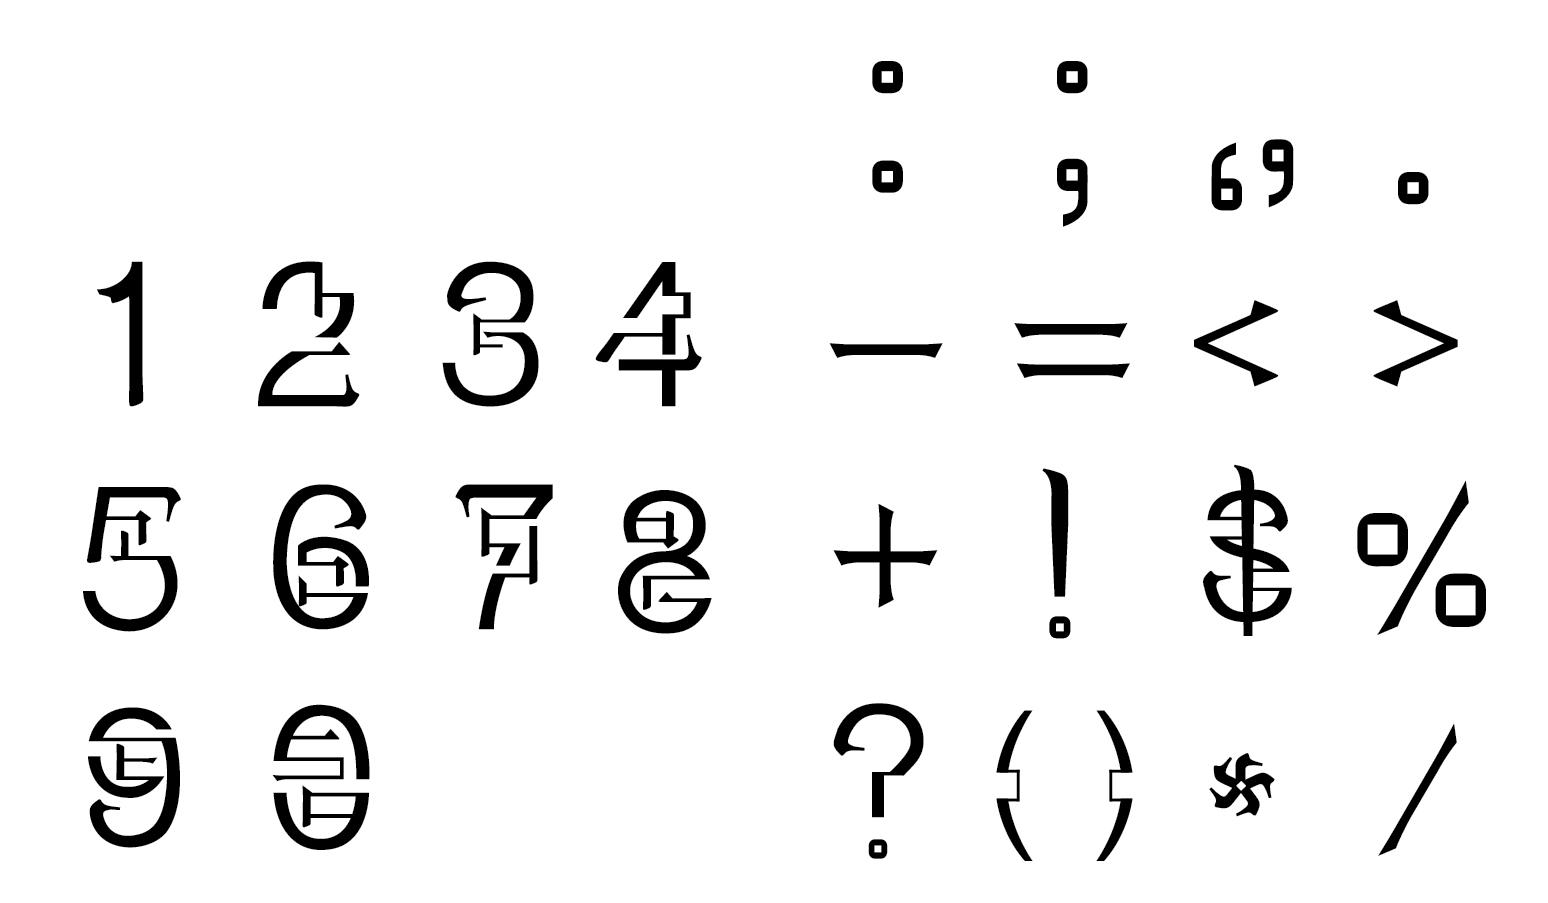 Valticao Typeface — Vanessa Gao